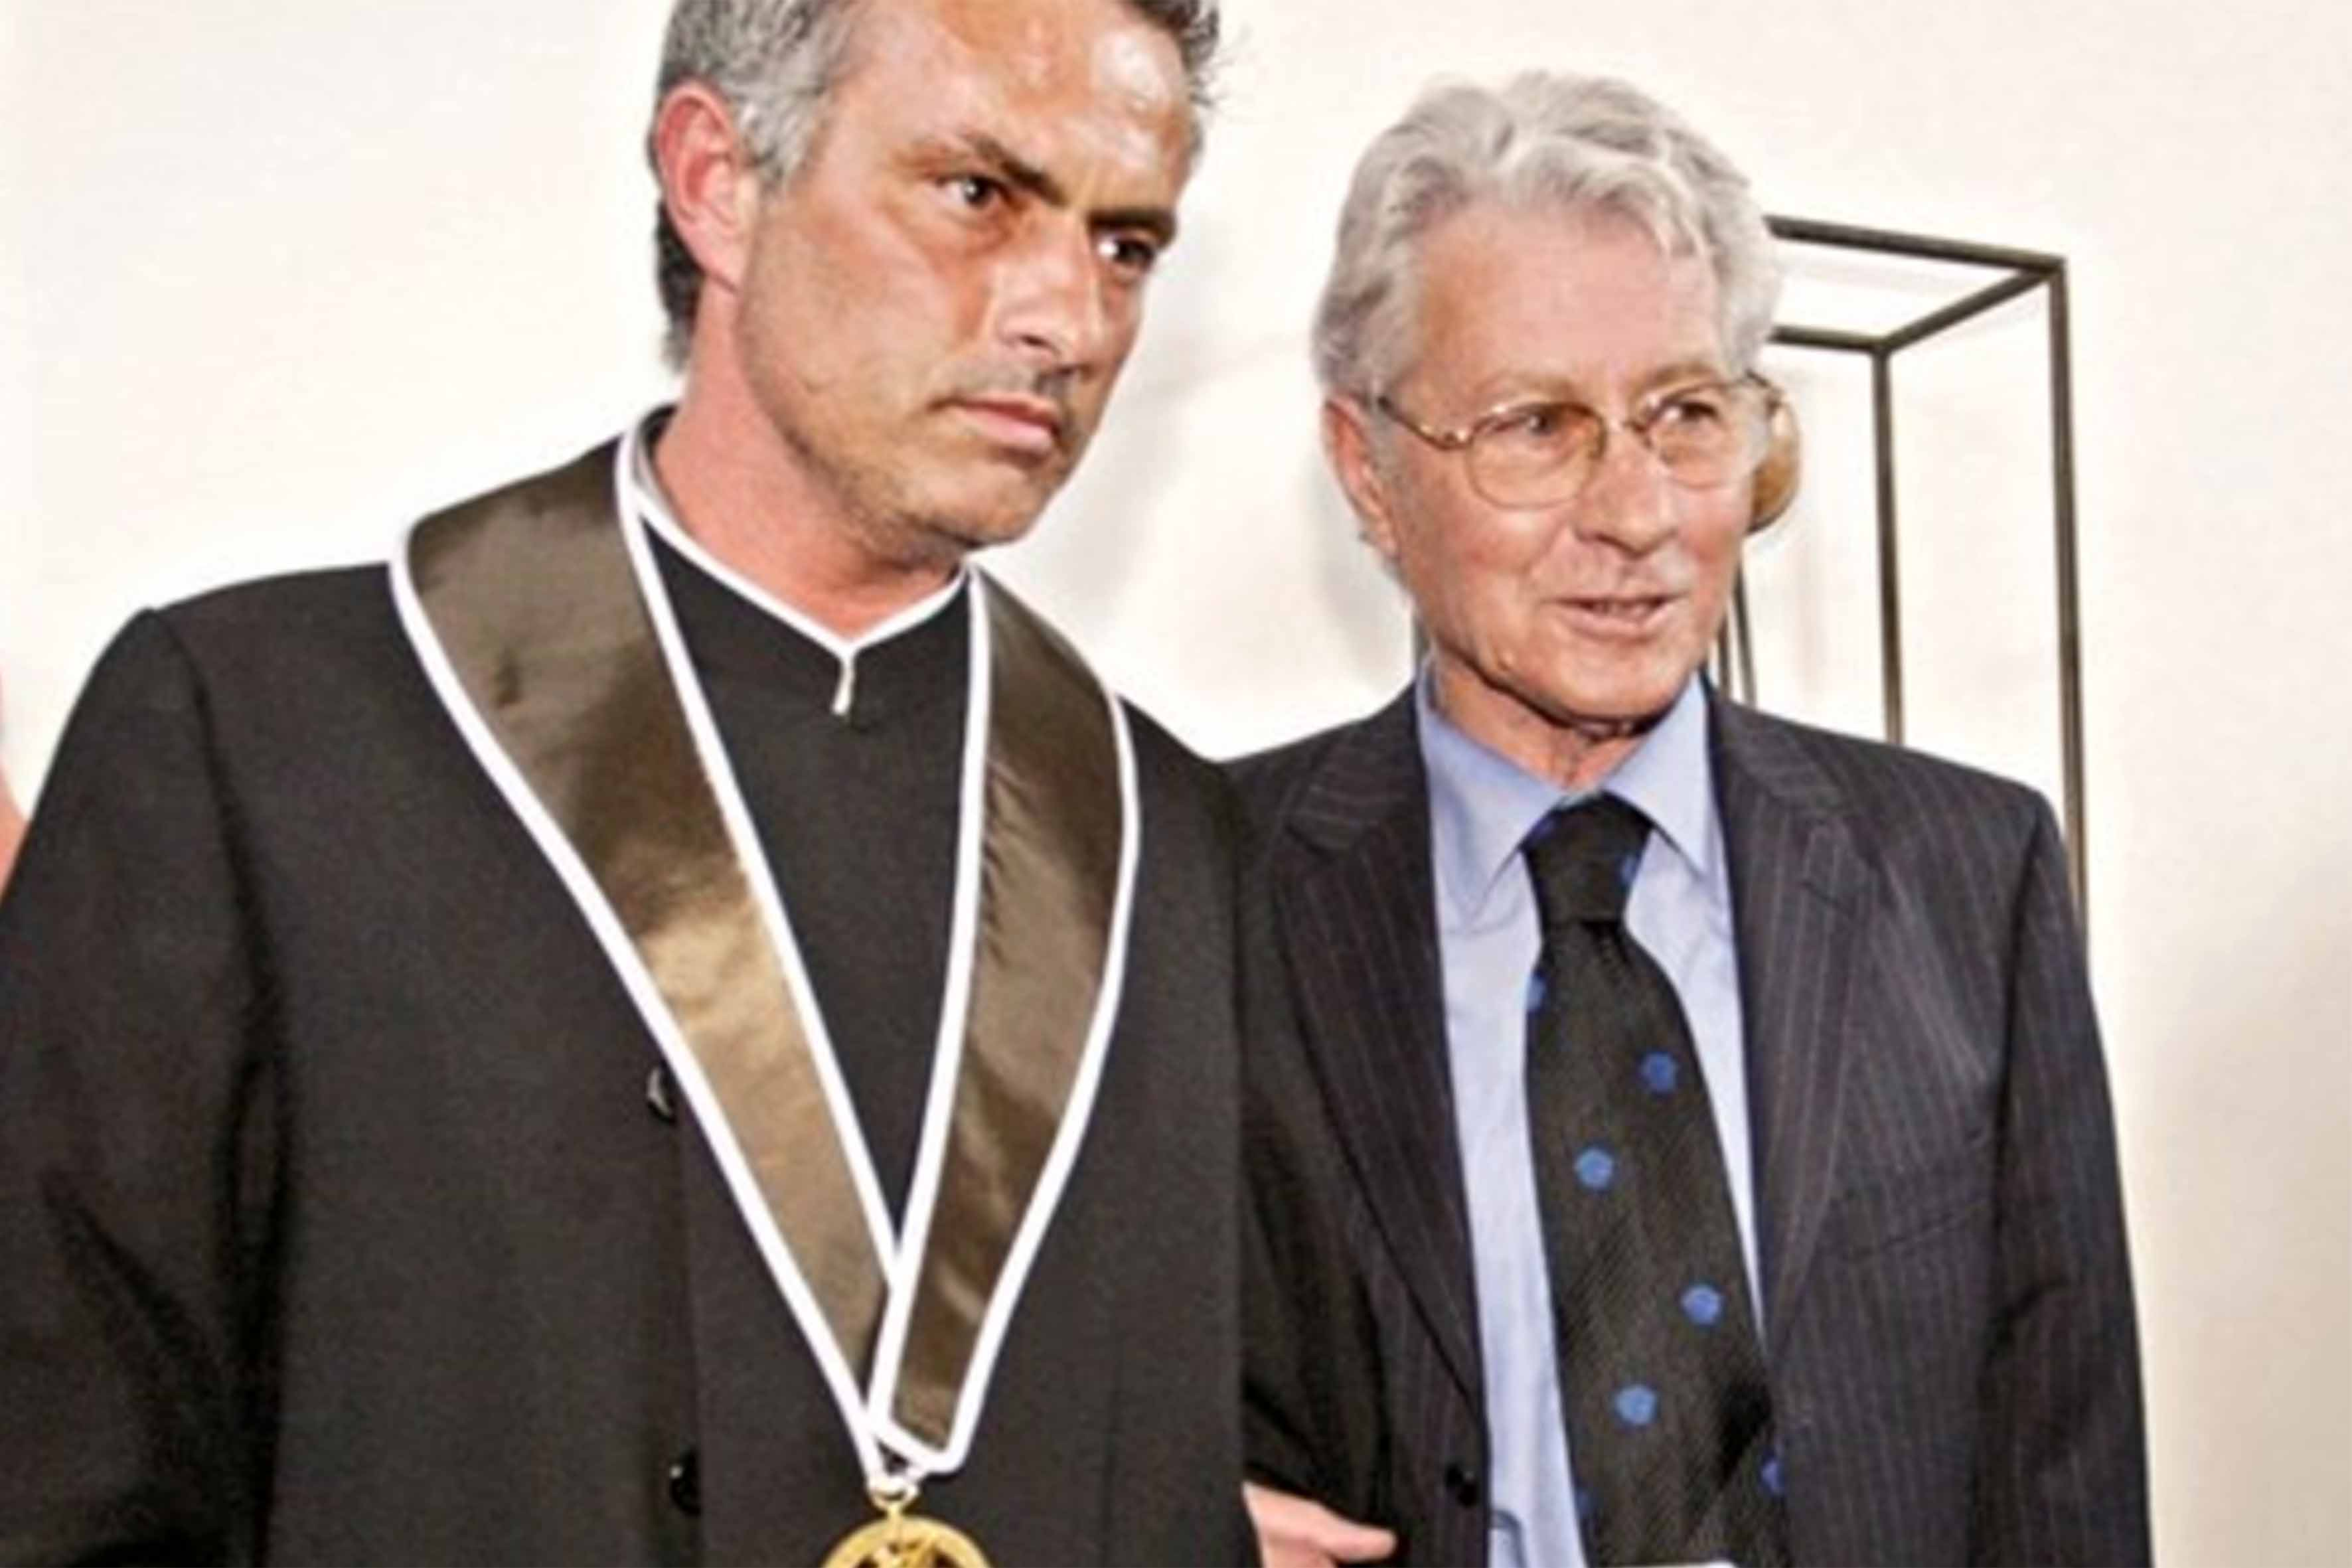 Faleceu José Manuel Mourinho Félix